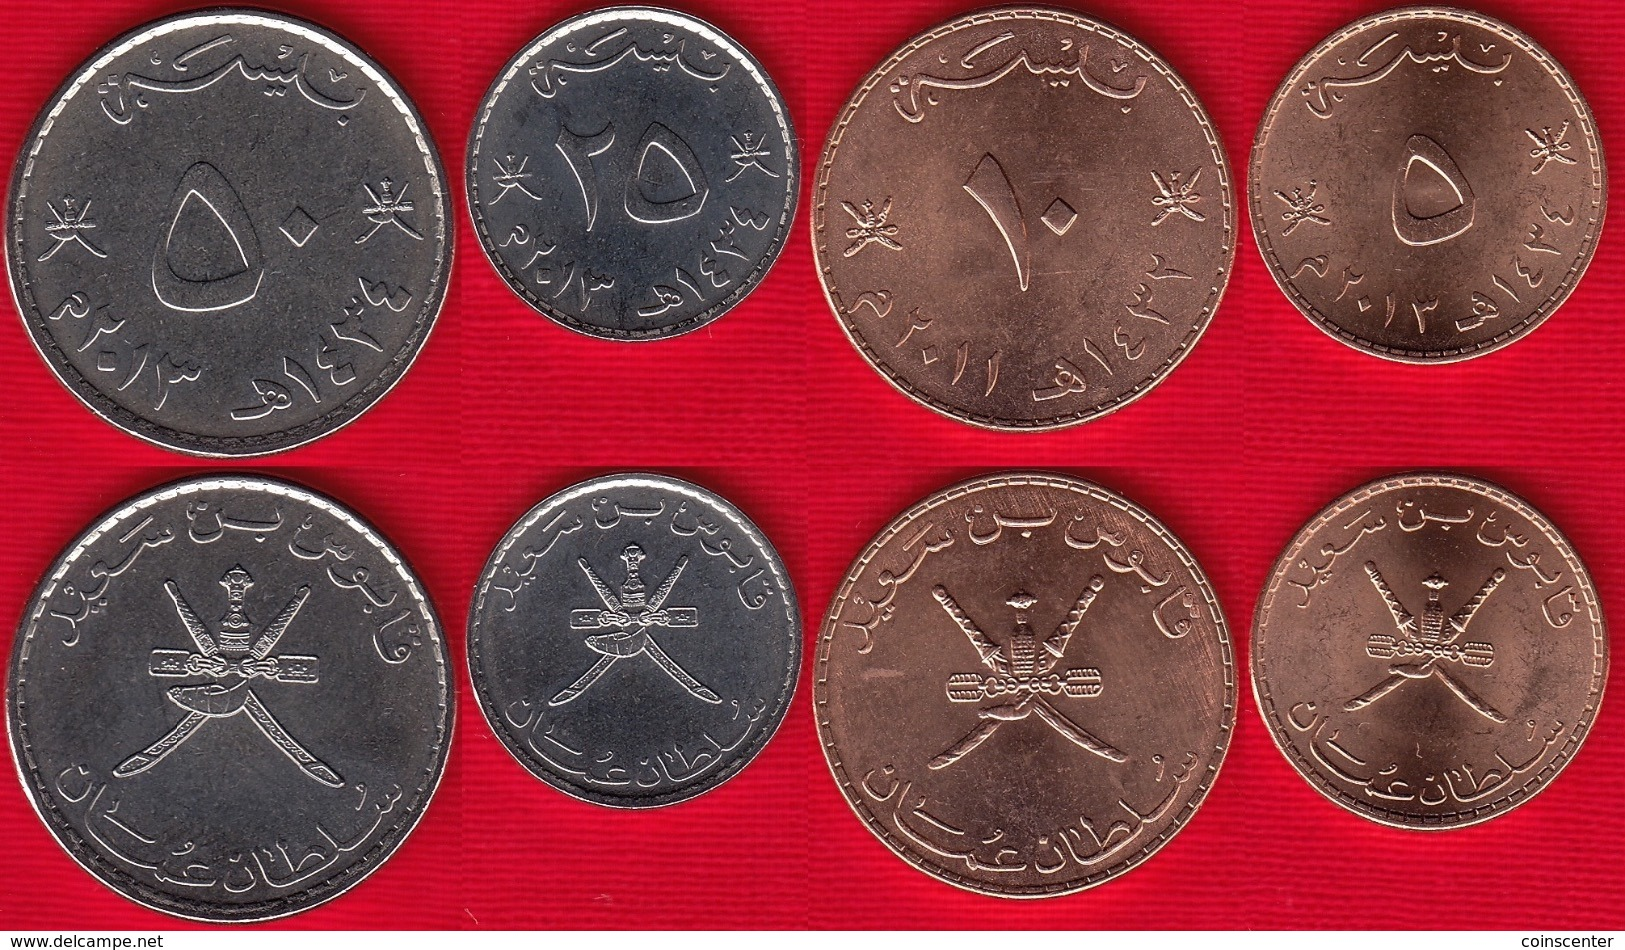 Oman Set Of 4 Coins: 5 - 50 Baisa (fils) 2011-2013 UNC - Oman